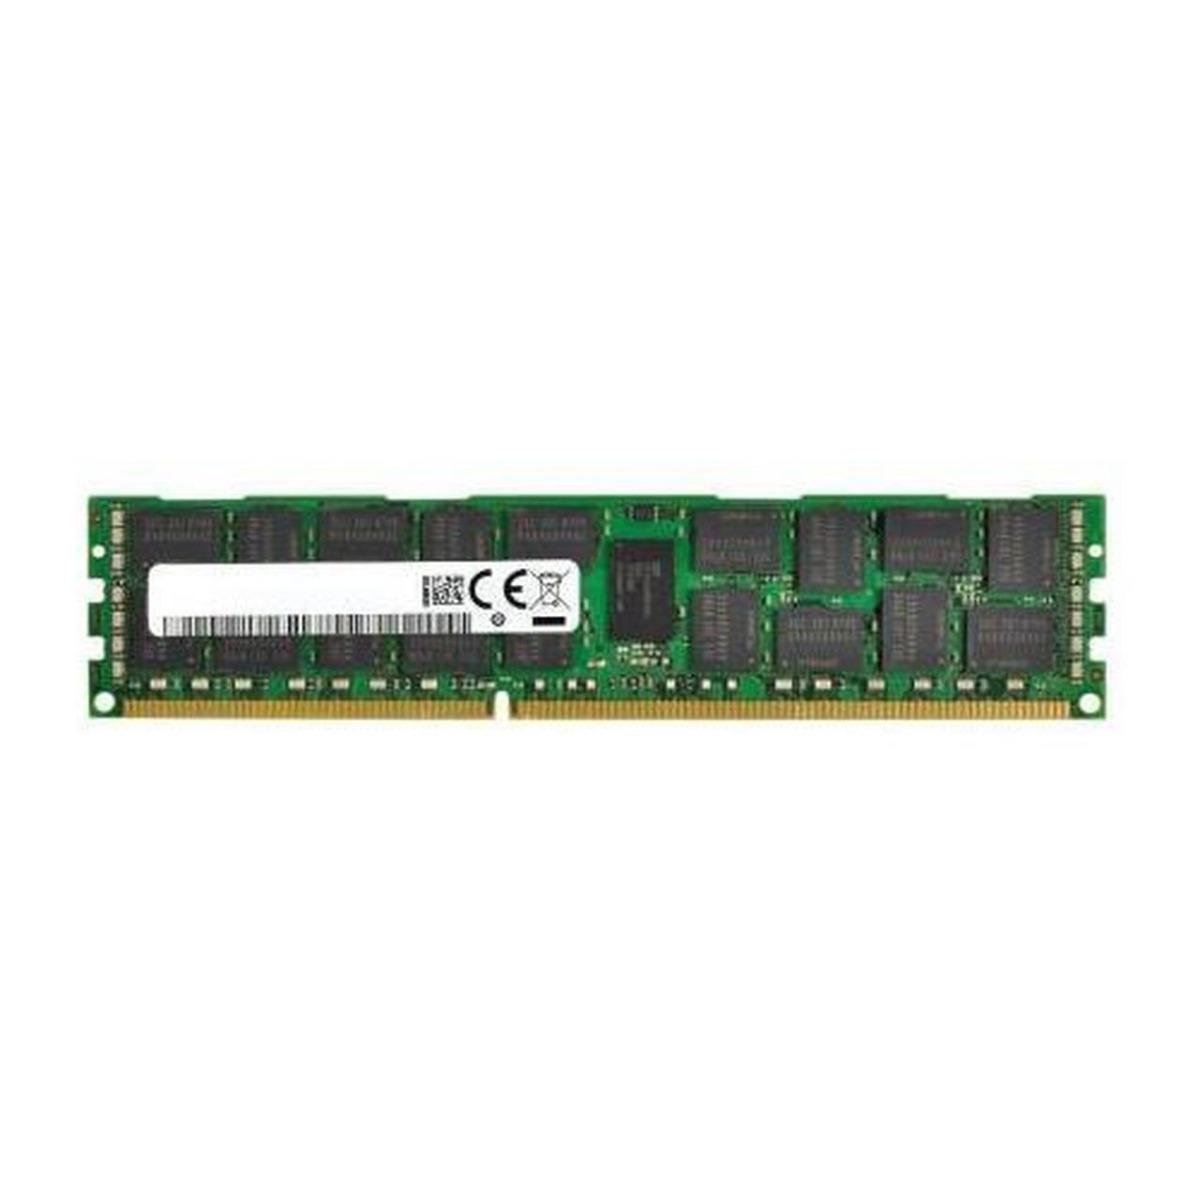 Bộ Nhớ RAM HP 2GB (1x2GB) Single Rank x8 PC3-12800E (DDR3-1600) Unbuffered CAS-11 Memory Kit